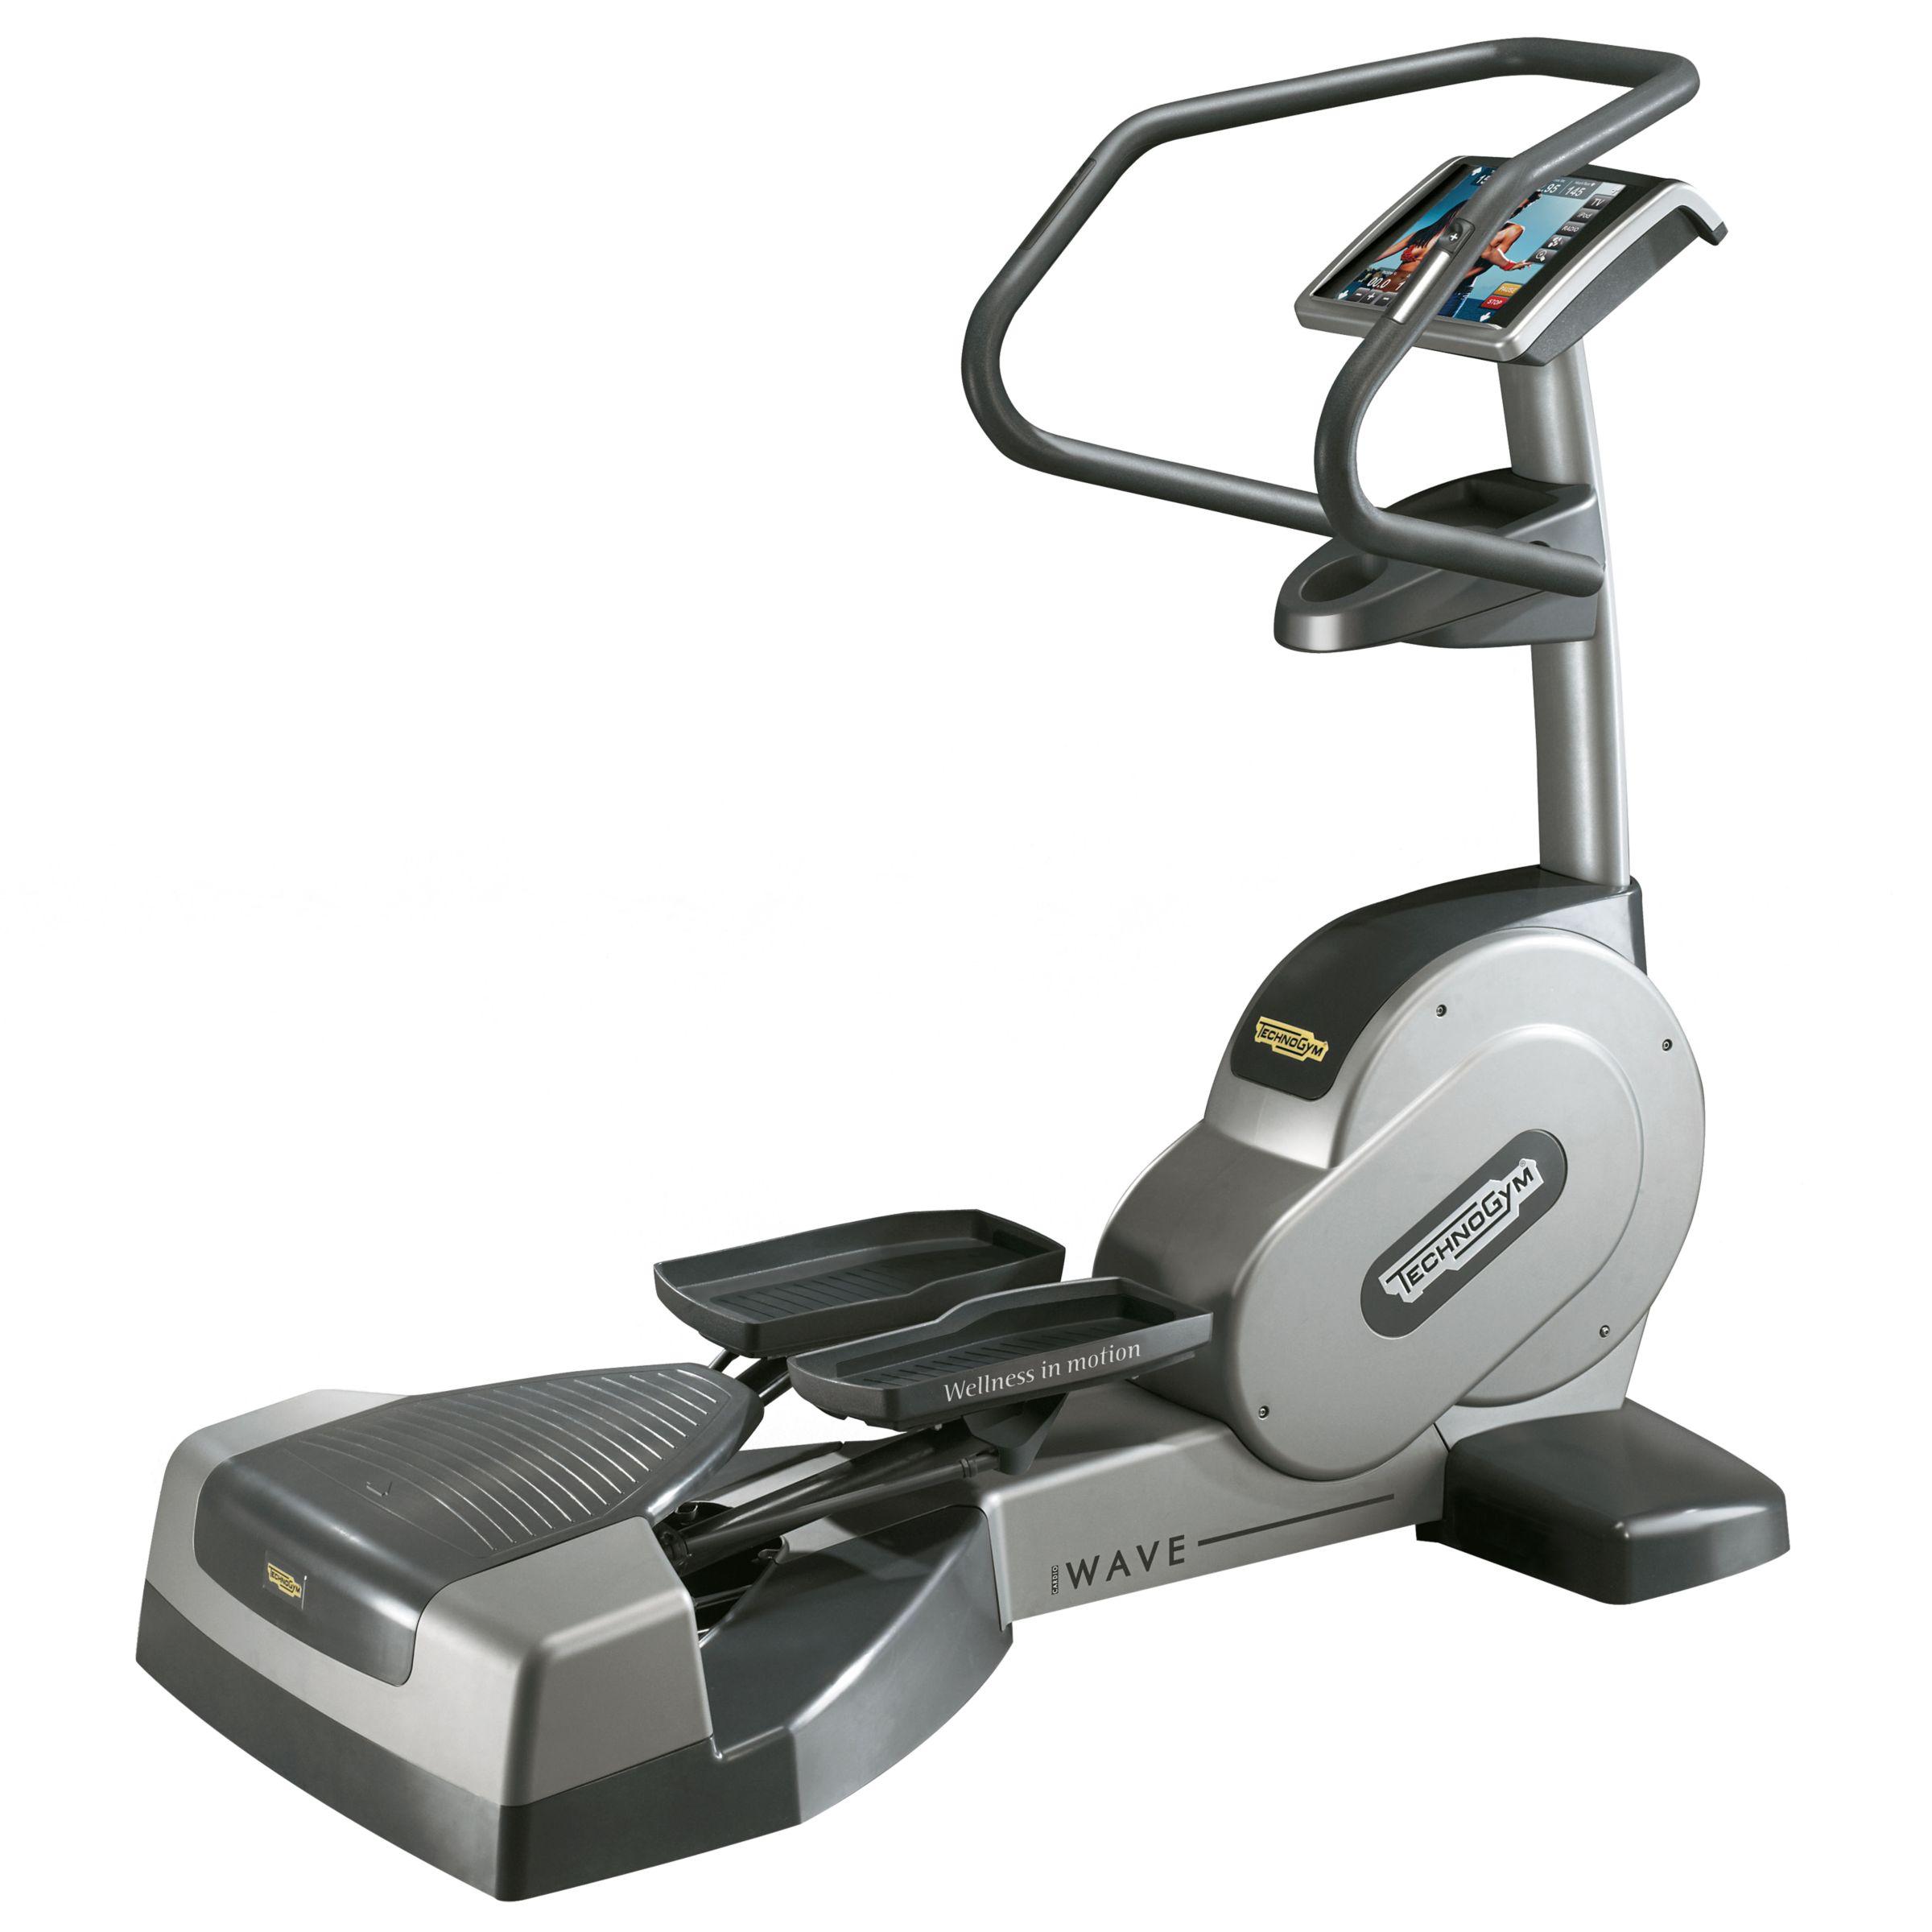 technogym crossover 700 visioweb elliptical trainer. Black Bedroom Furniture Sets. Home Design Ideas